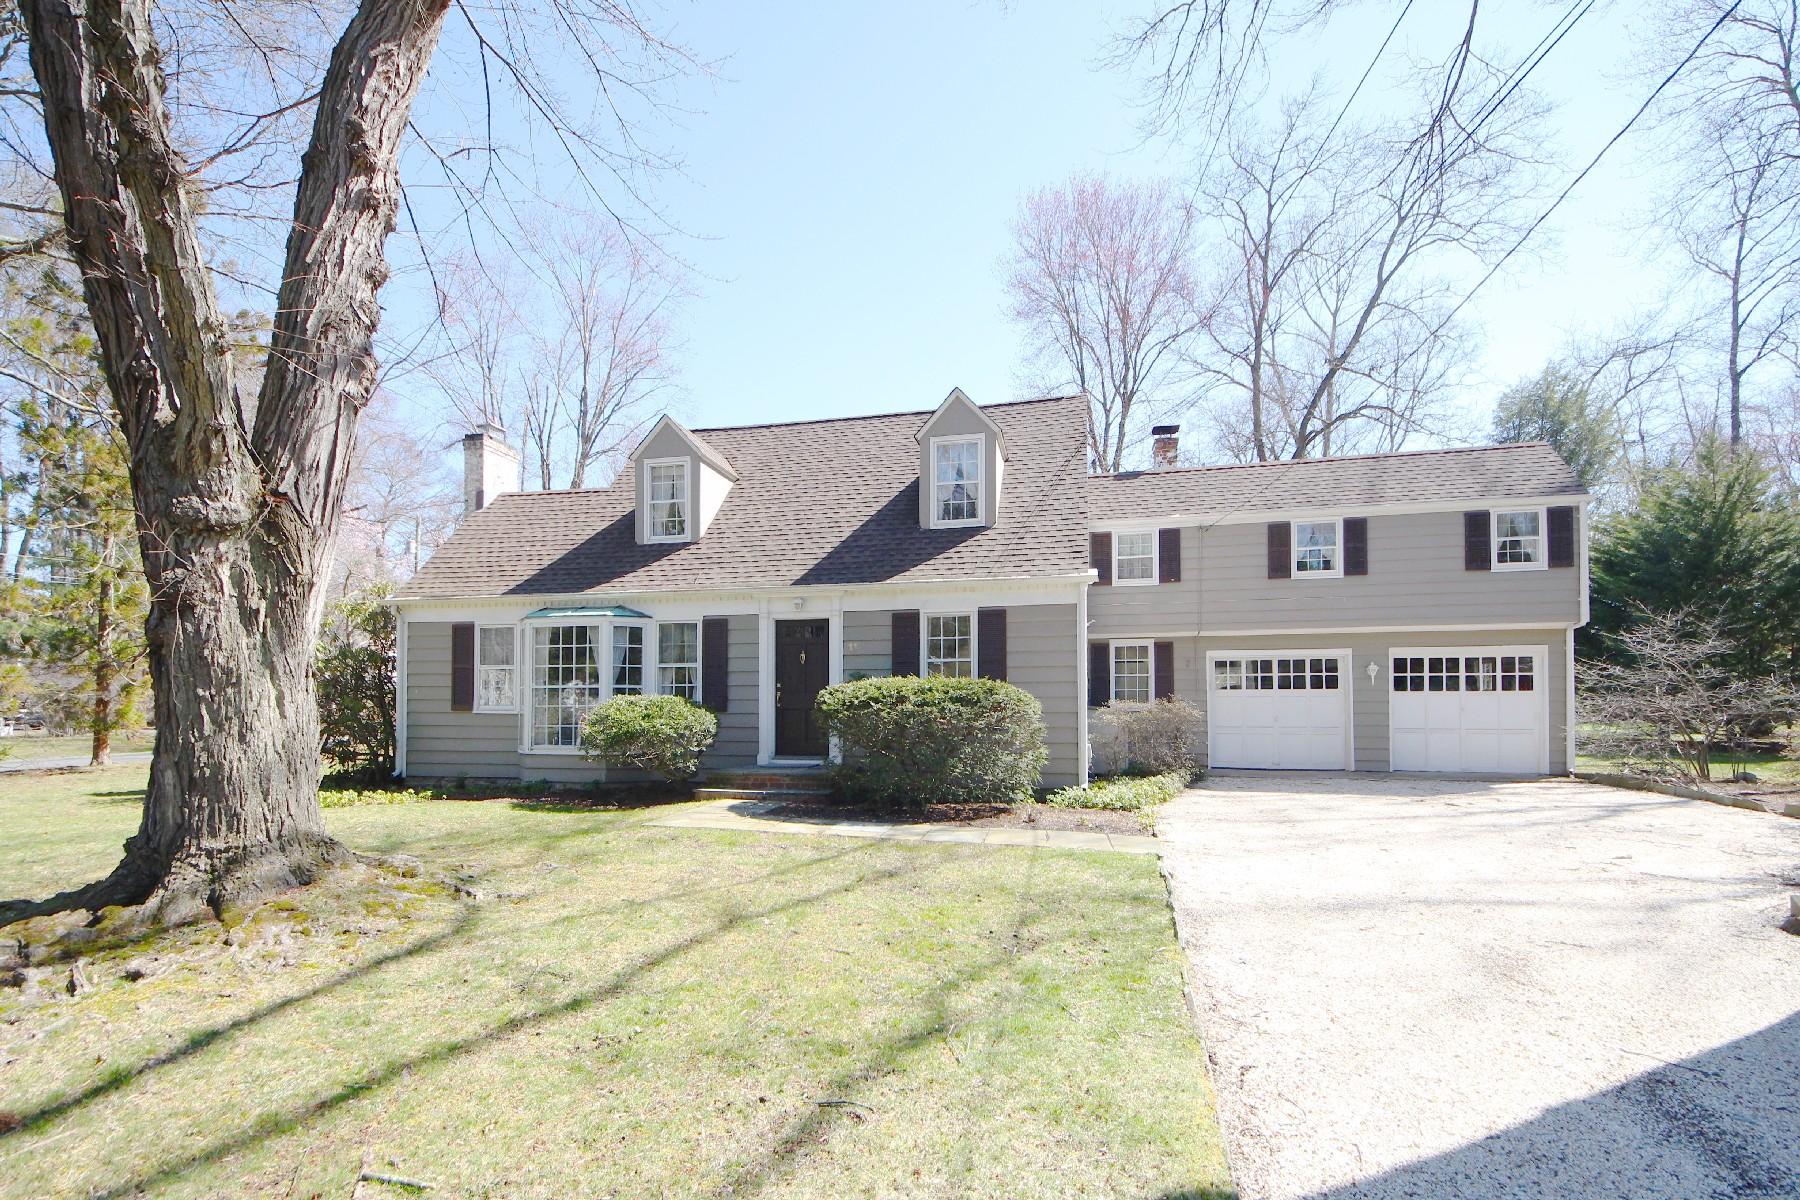 Casa para uma família para Venda às Quintessential Cape Cod Home 11 Rocaton Road Darien, Connecticut, 06820 Estados Unidos